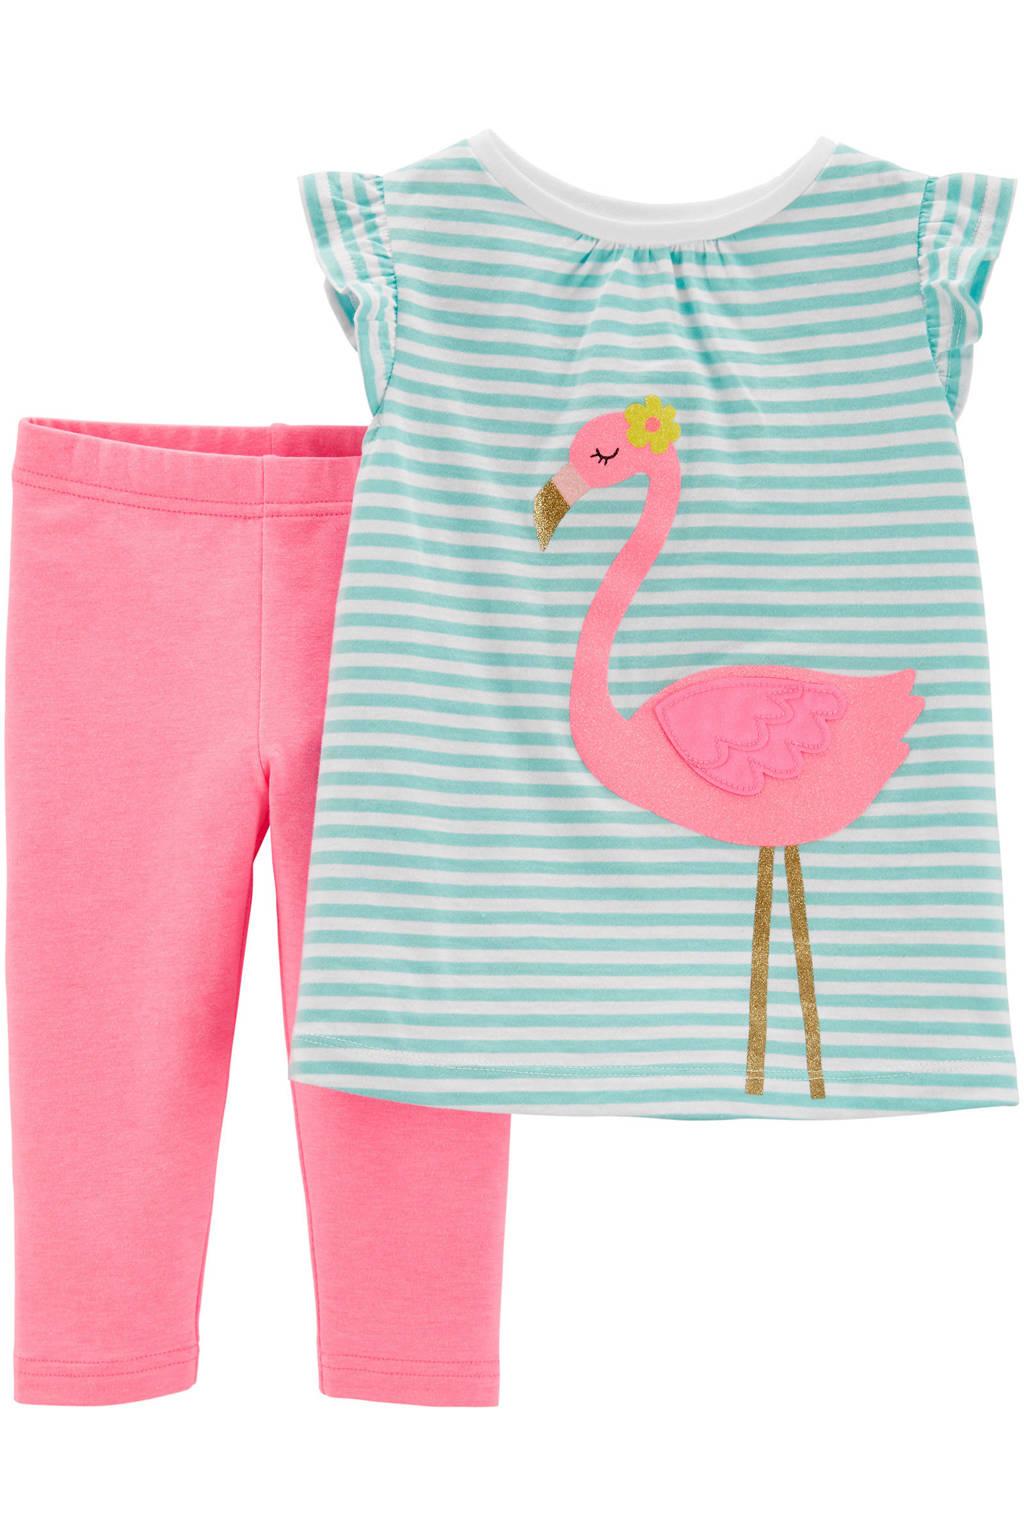 Carter's tuniek + legging, Lichtblauw/wit/roze